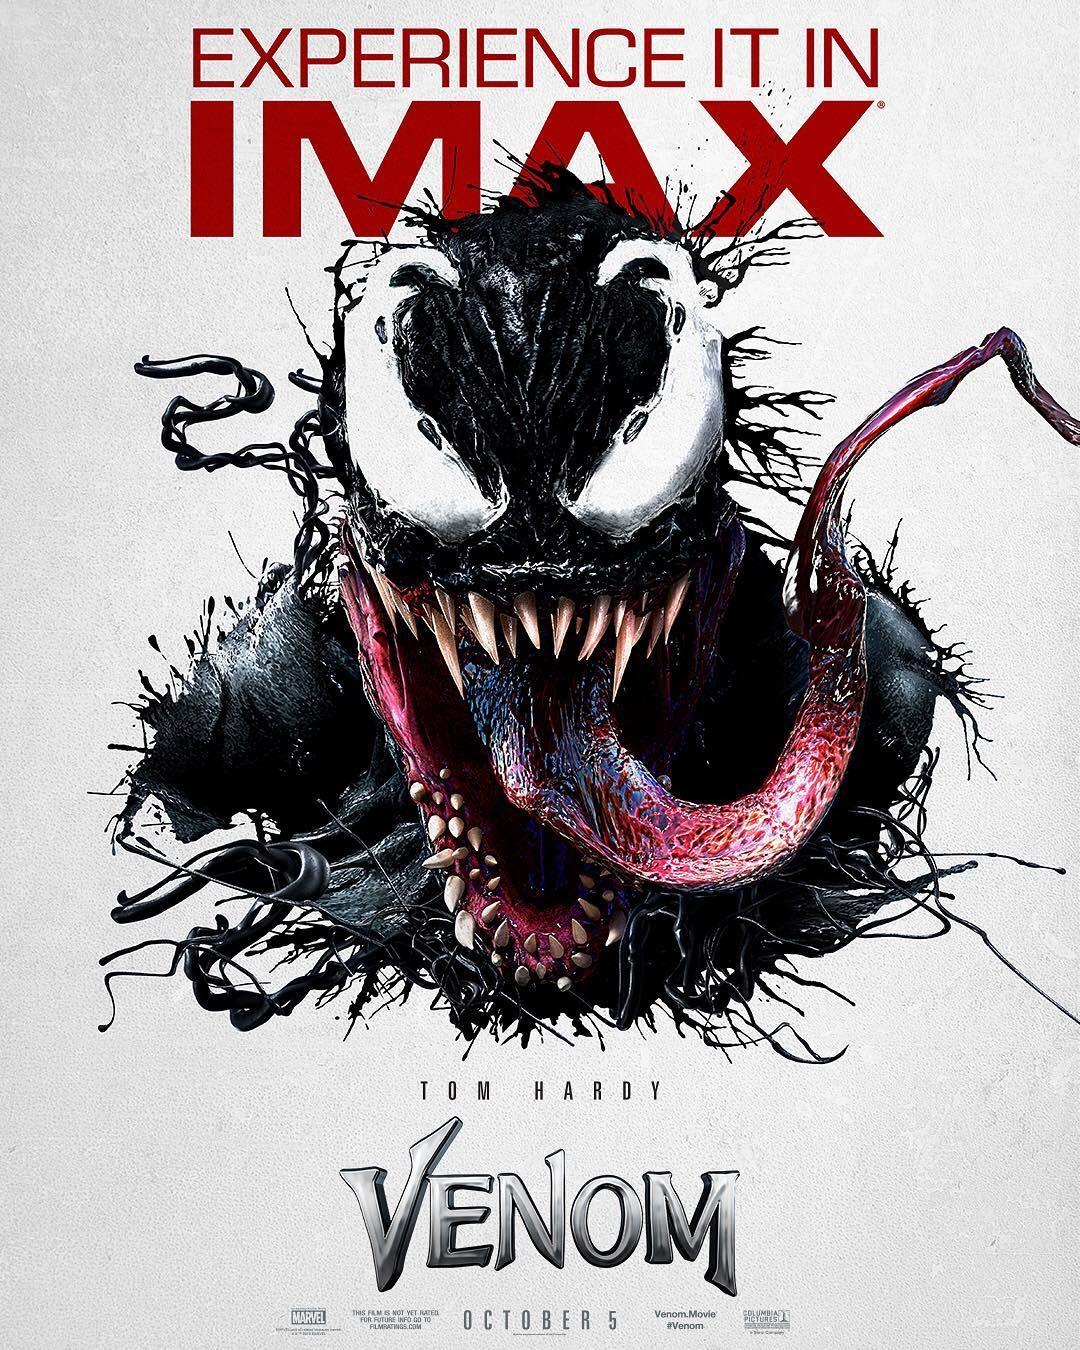 IMAX poster for Venom